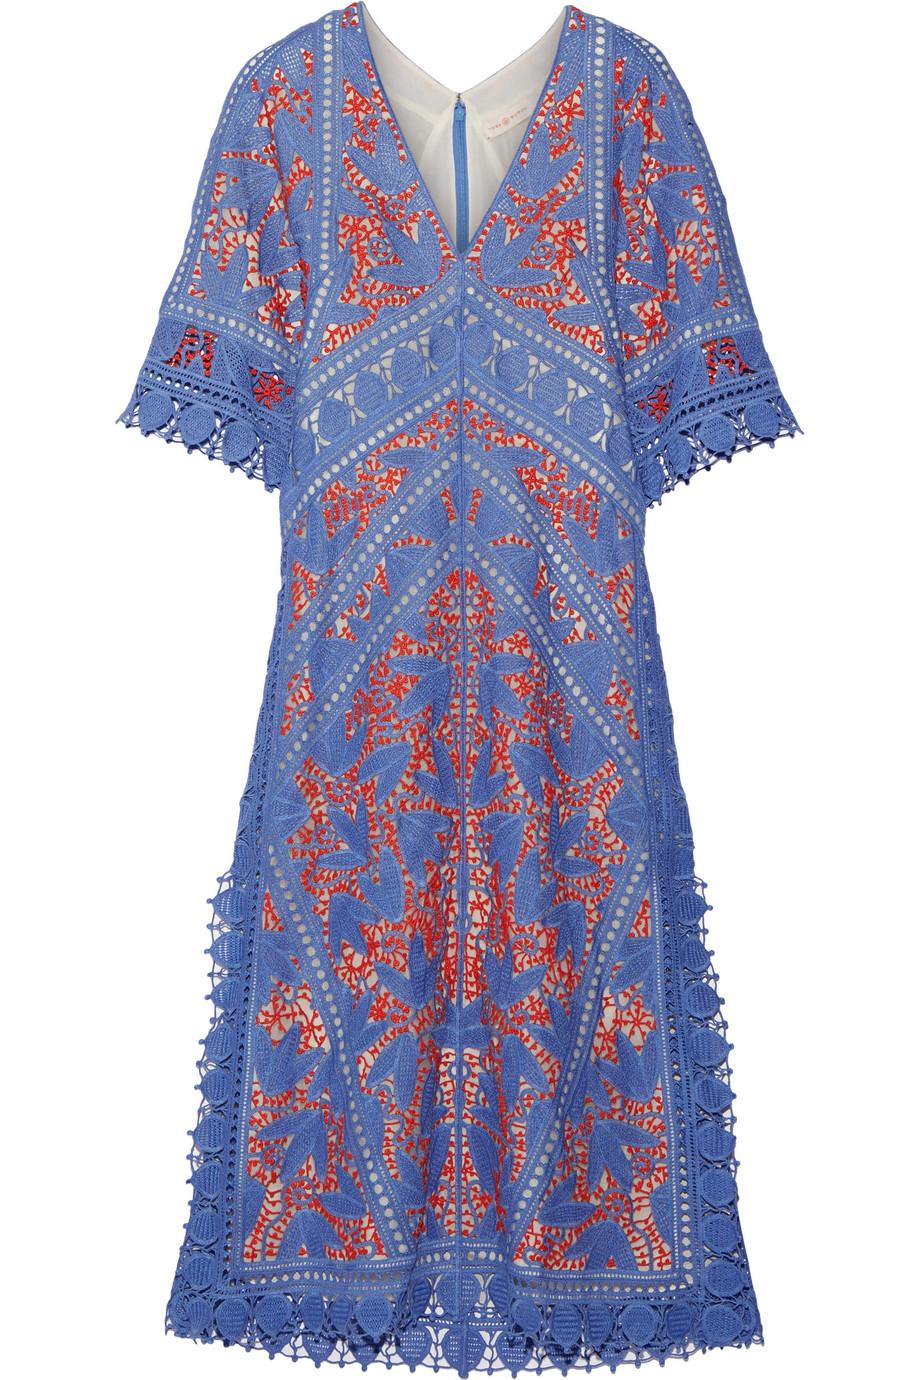 Tory Burch Michaella Guipure Lace-Trimmed Crocheted Dress, Light Blue, Women's, Size: 4